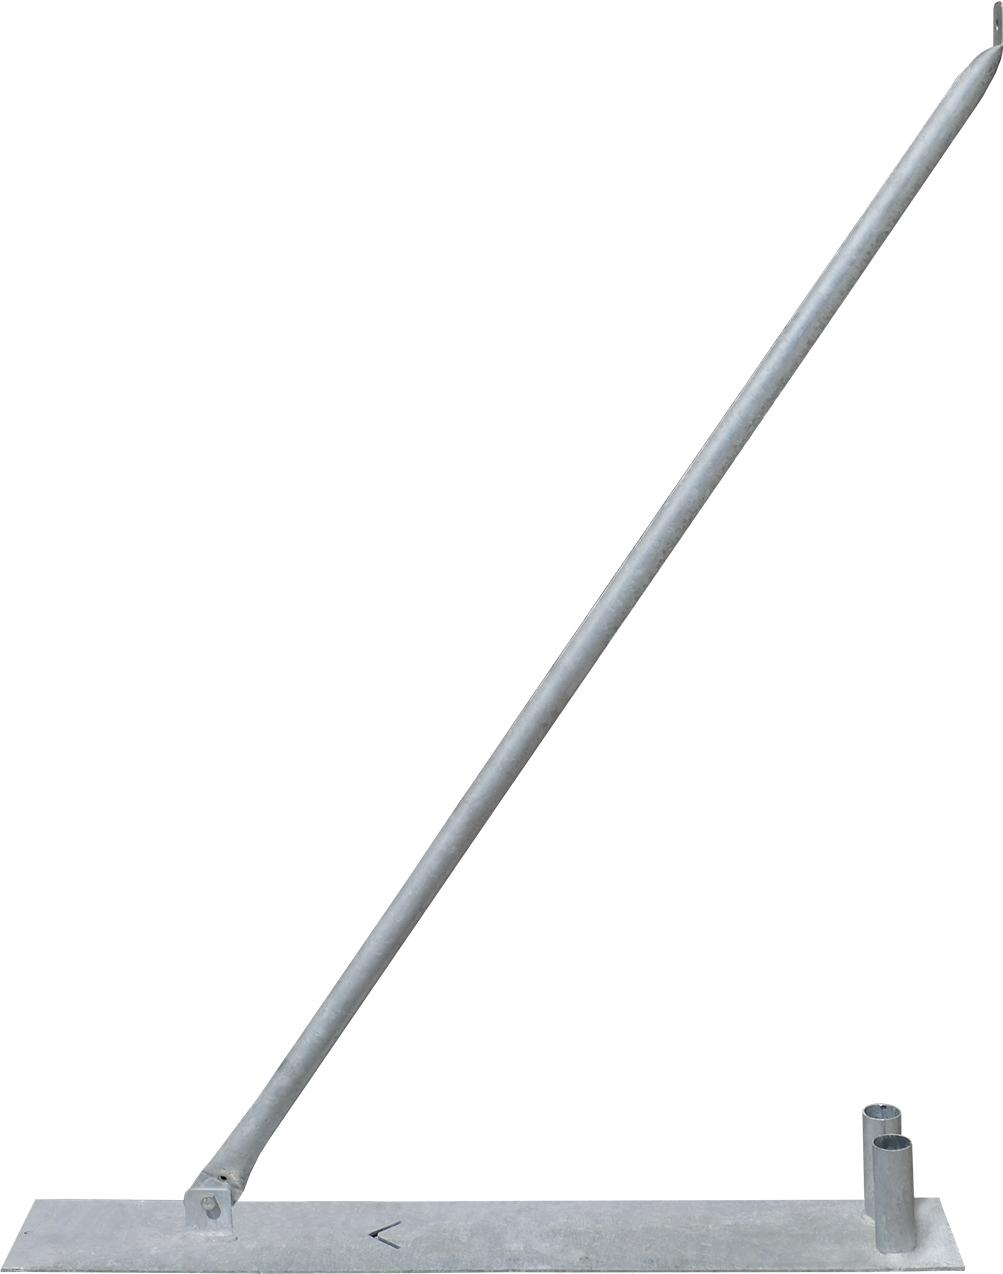 Schake Mobilzaun-Stützstrebe für 2,00 m Bauzaun inkl. Bodenplatte